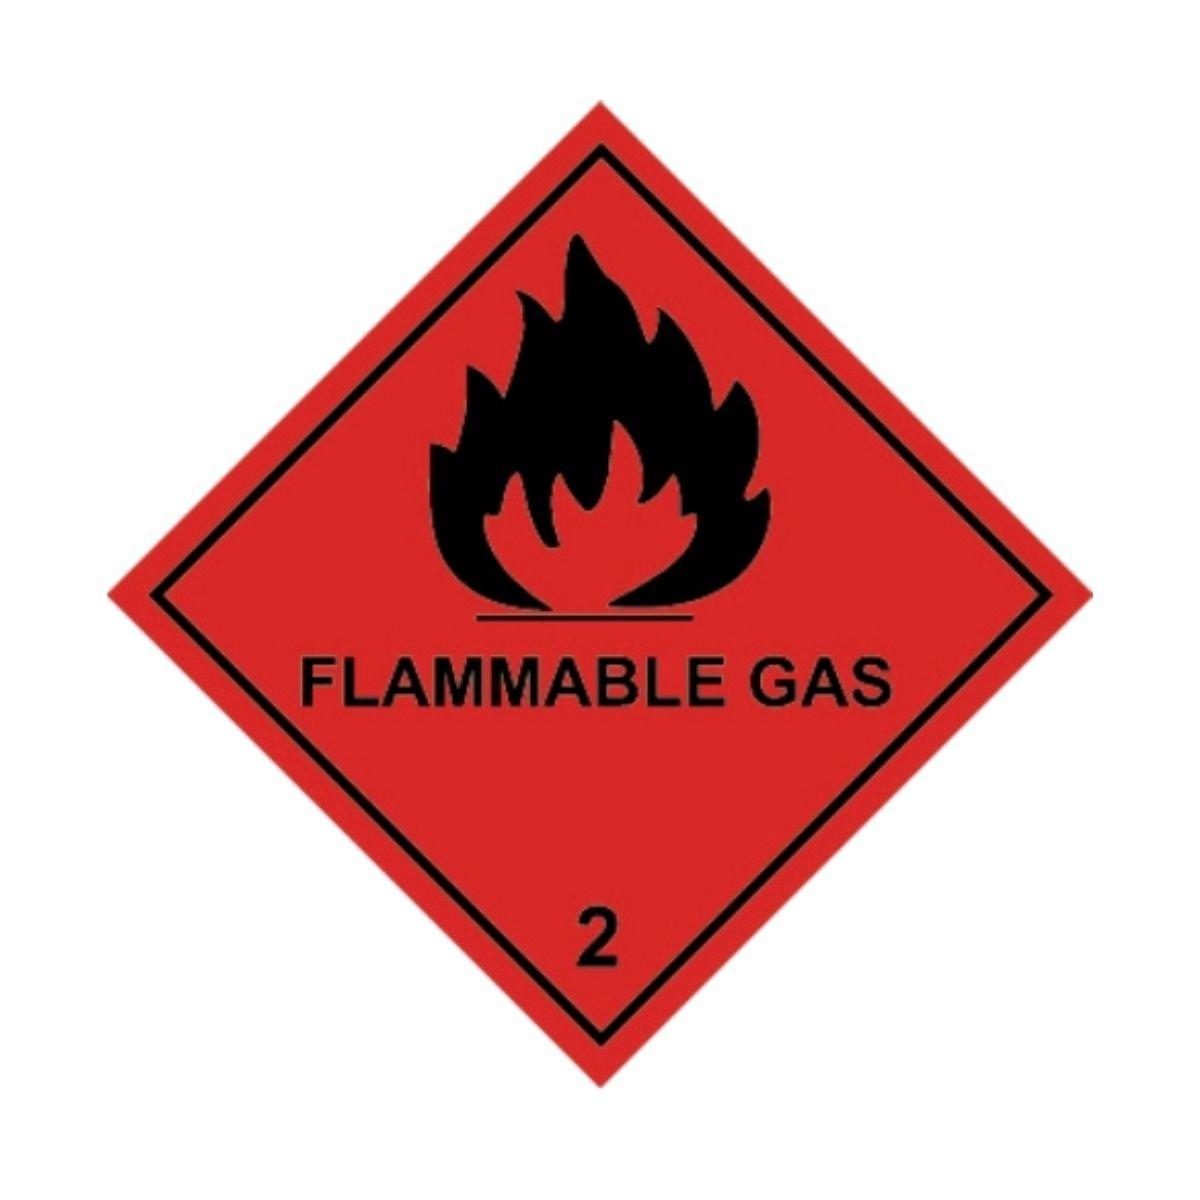 HD1230 UN Hazard Warning Diamond Class 2 Flammable Gas